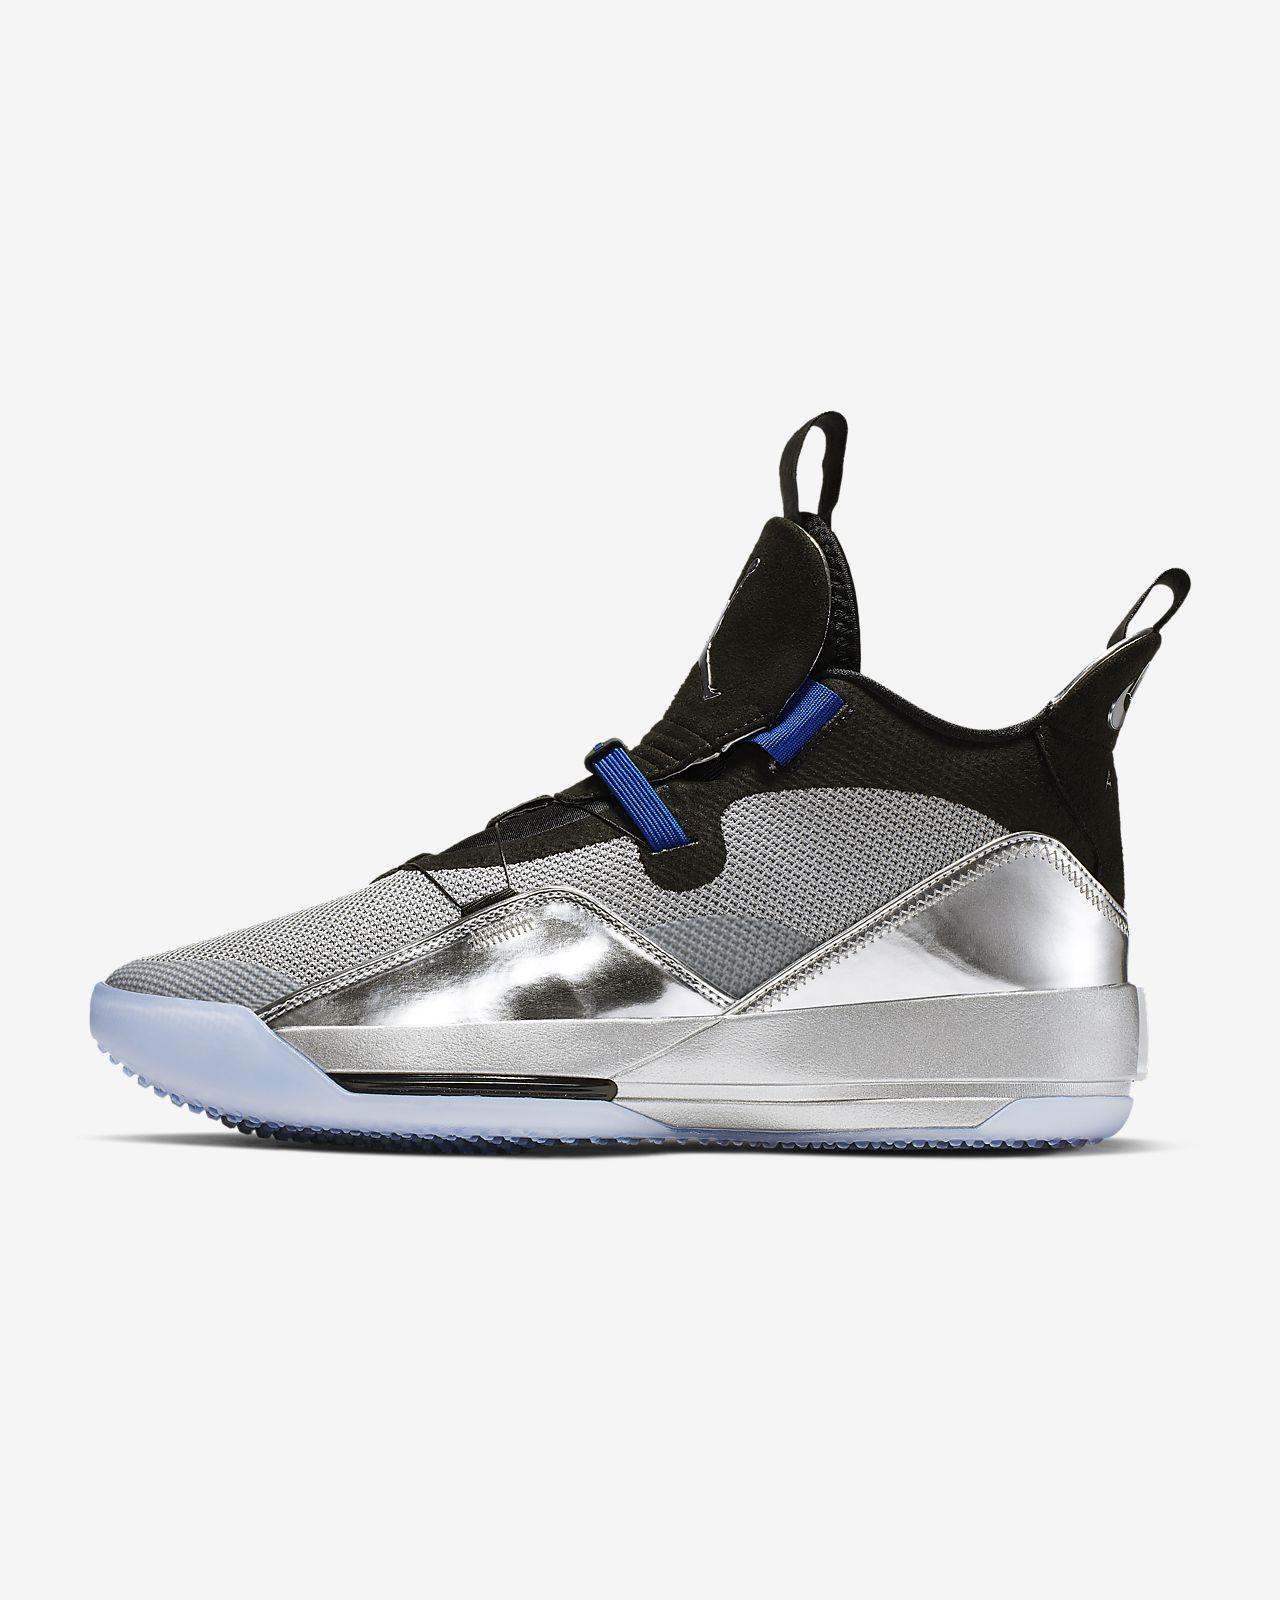 Sapatilhas de basquetebol Air Jordan XXXIII